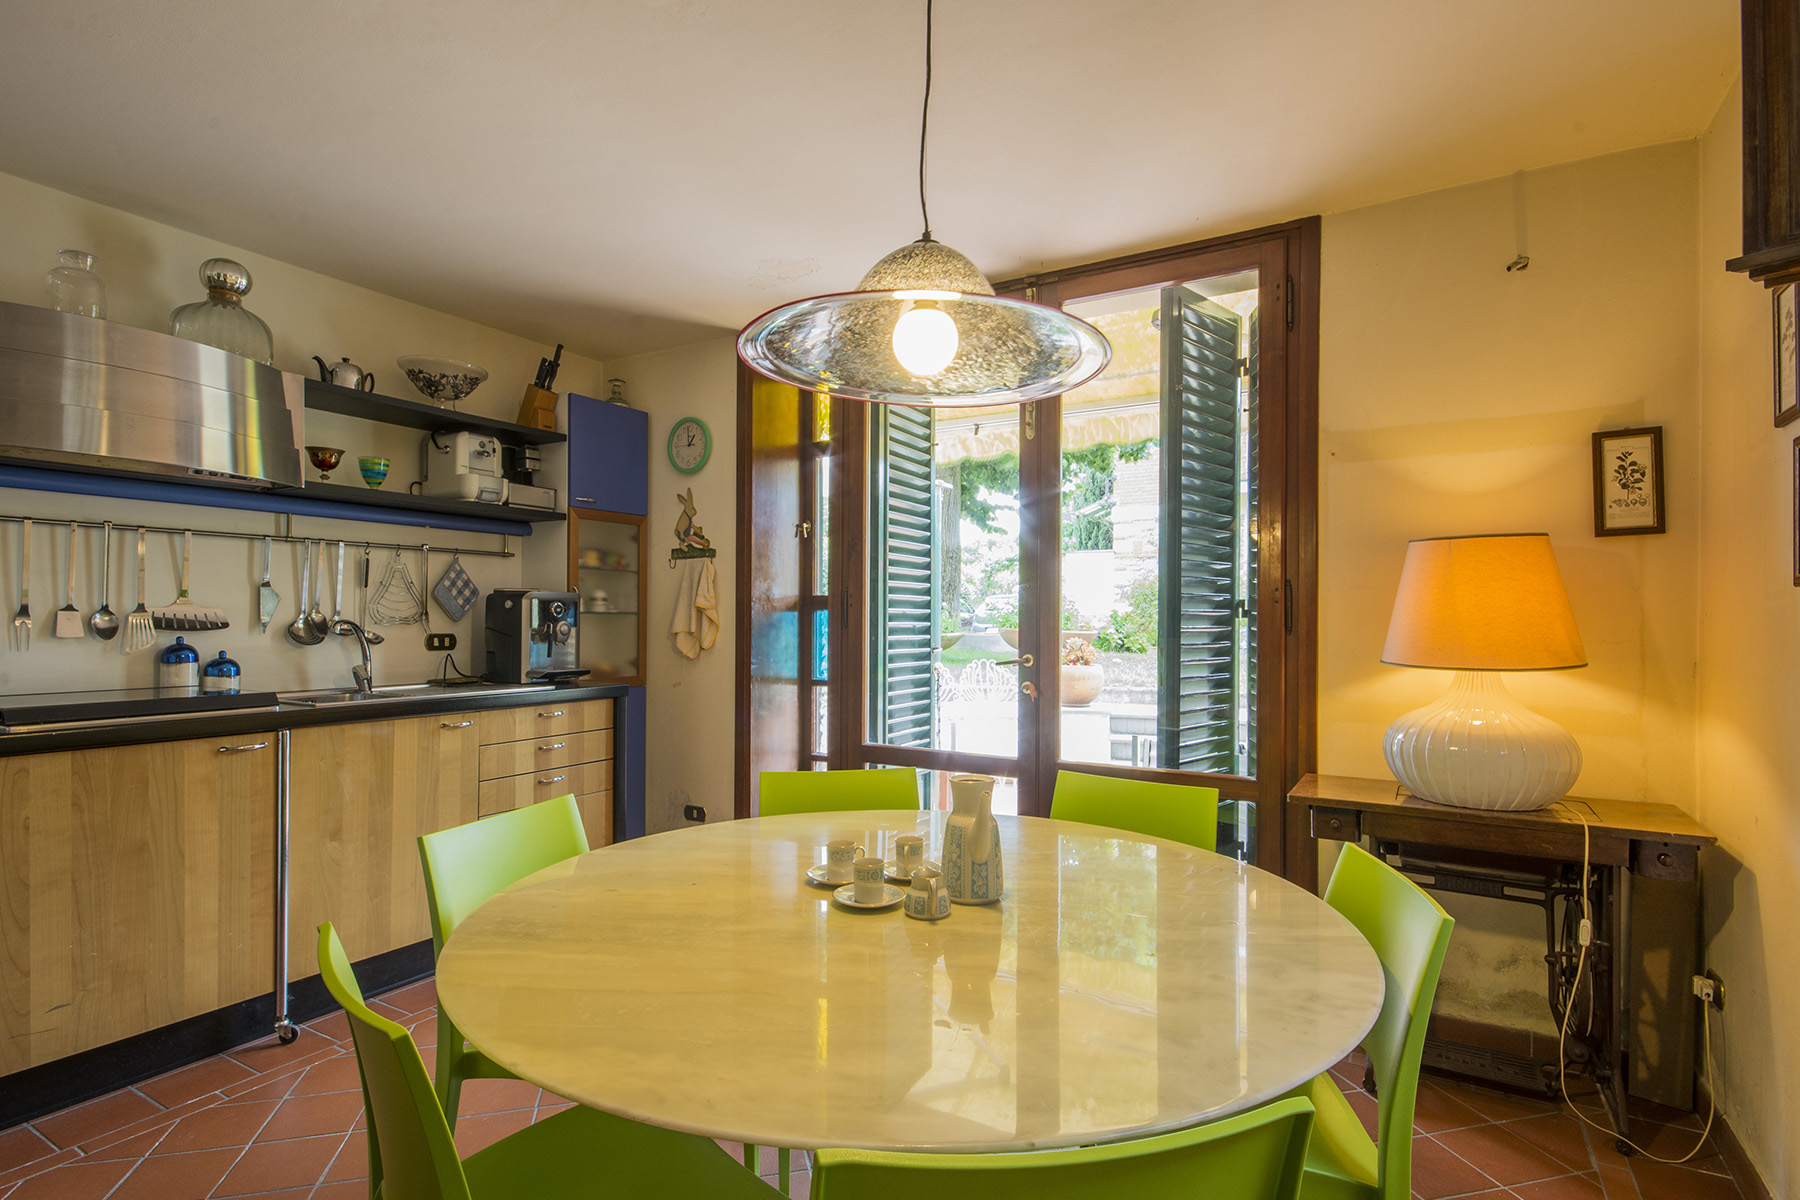 Villa in Vendita a Lucca: 5 locali, 500 mq - Foto 8